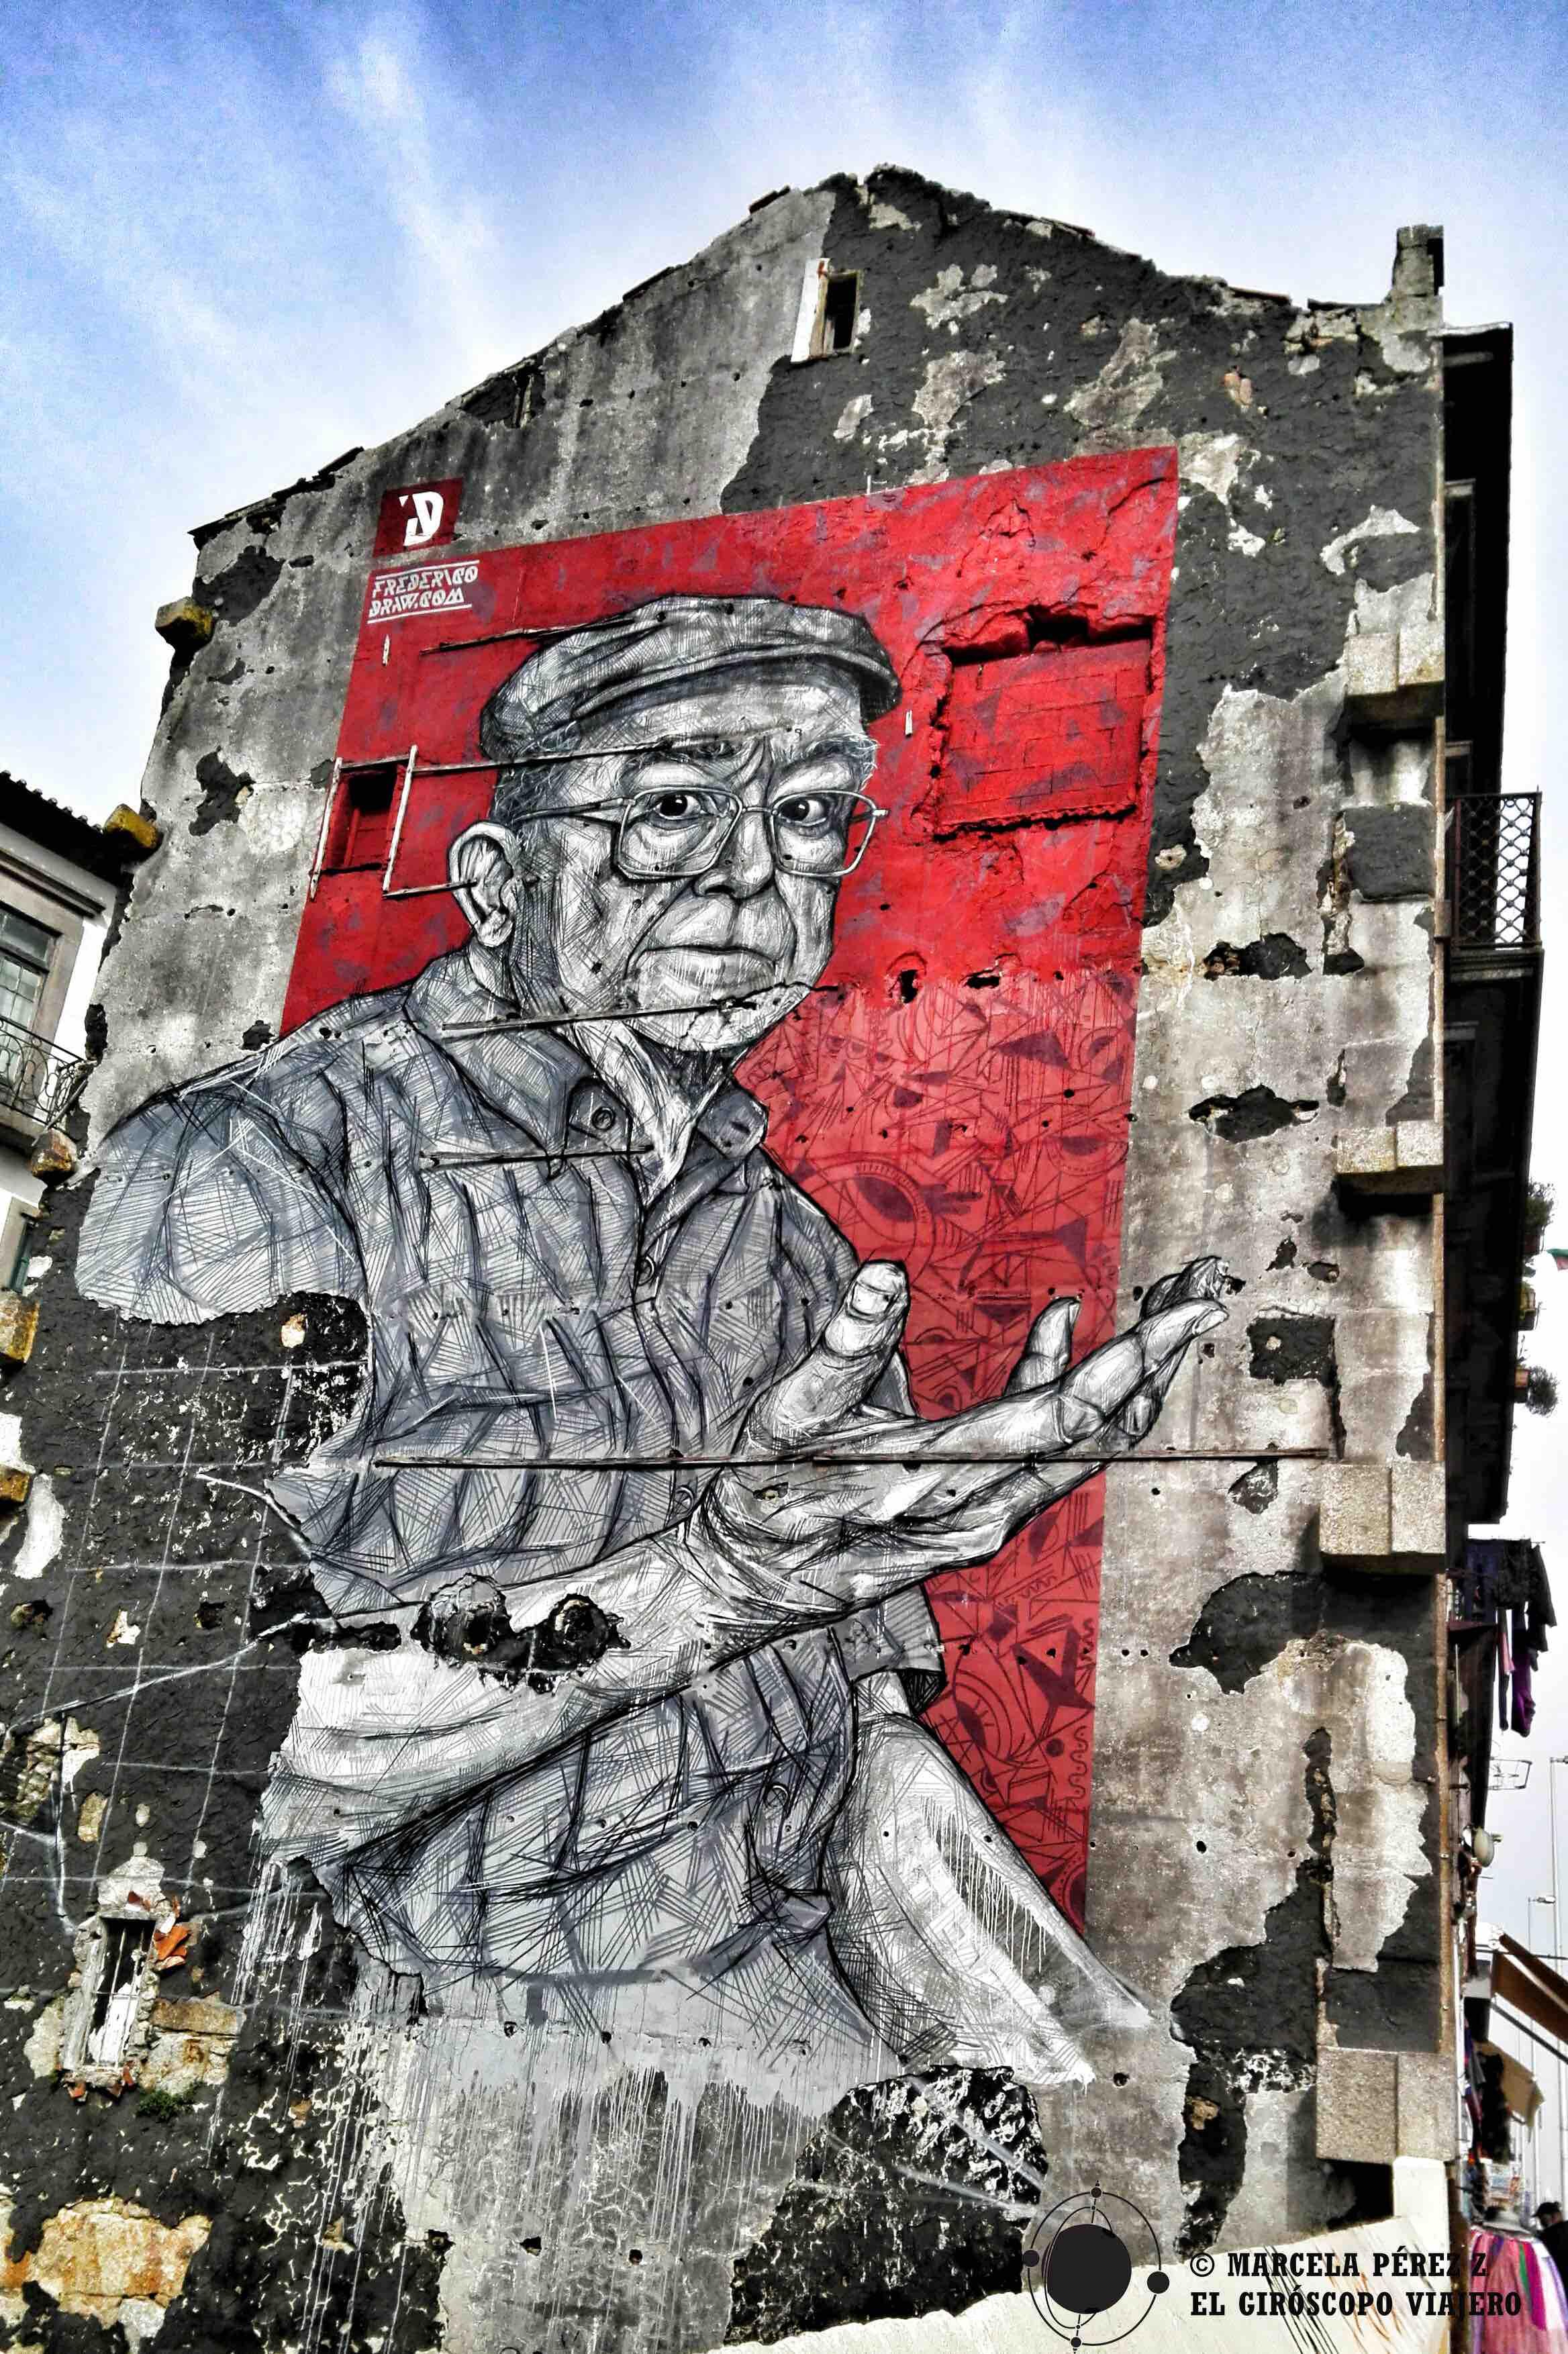 Preciosos murales en Glasgow no pasan indeferentes a la vista ©Marcela Pérez Z.